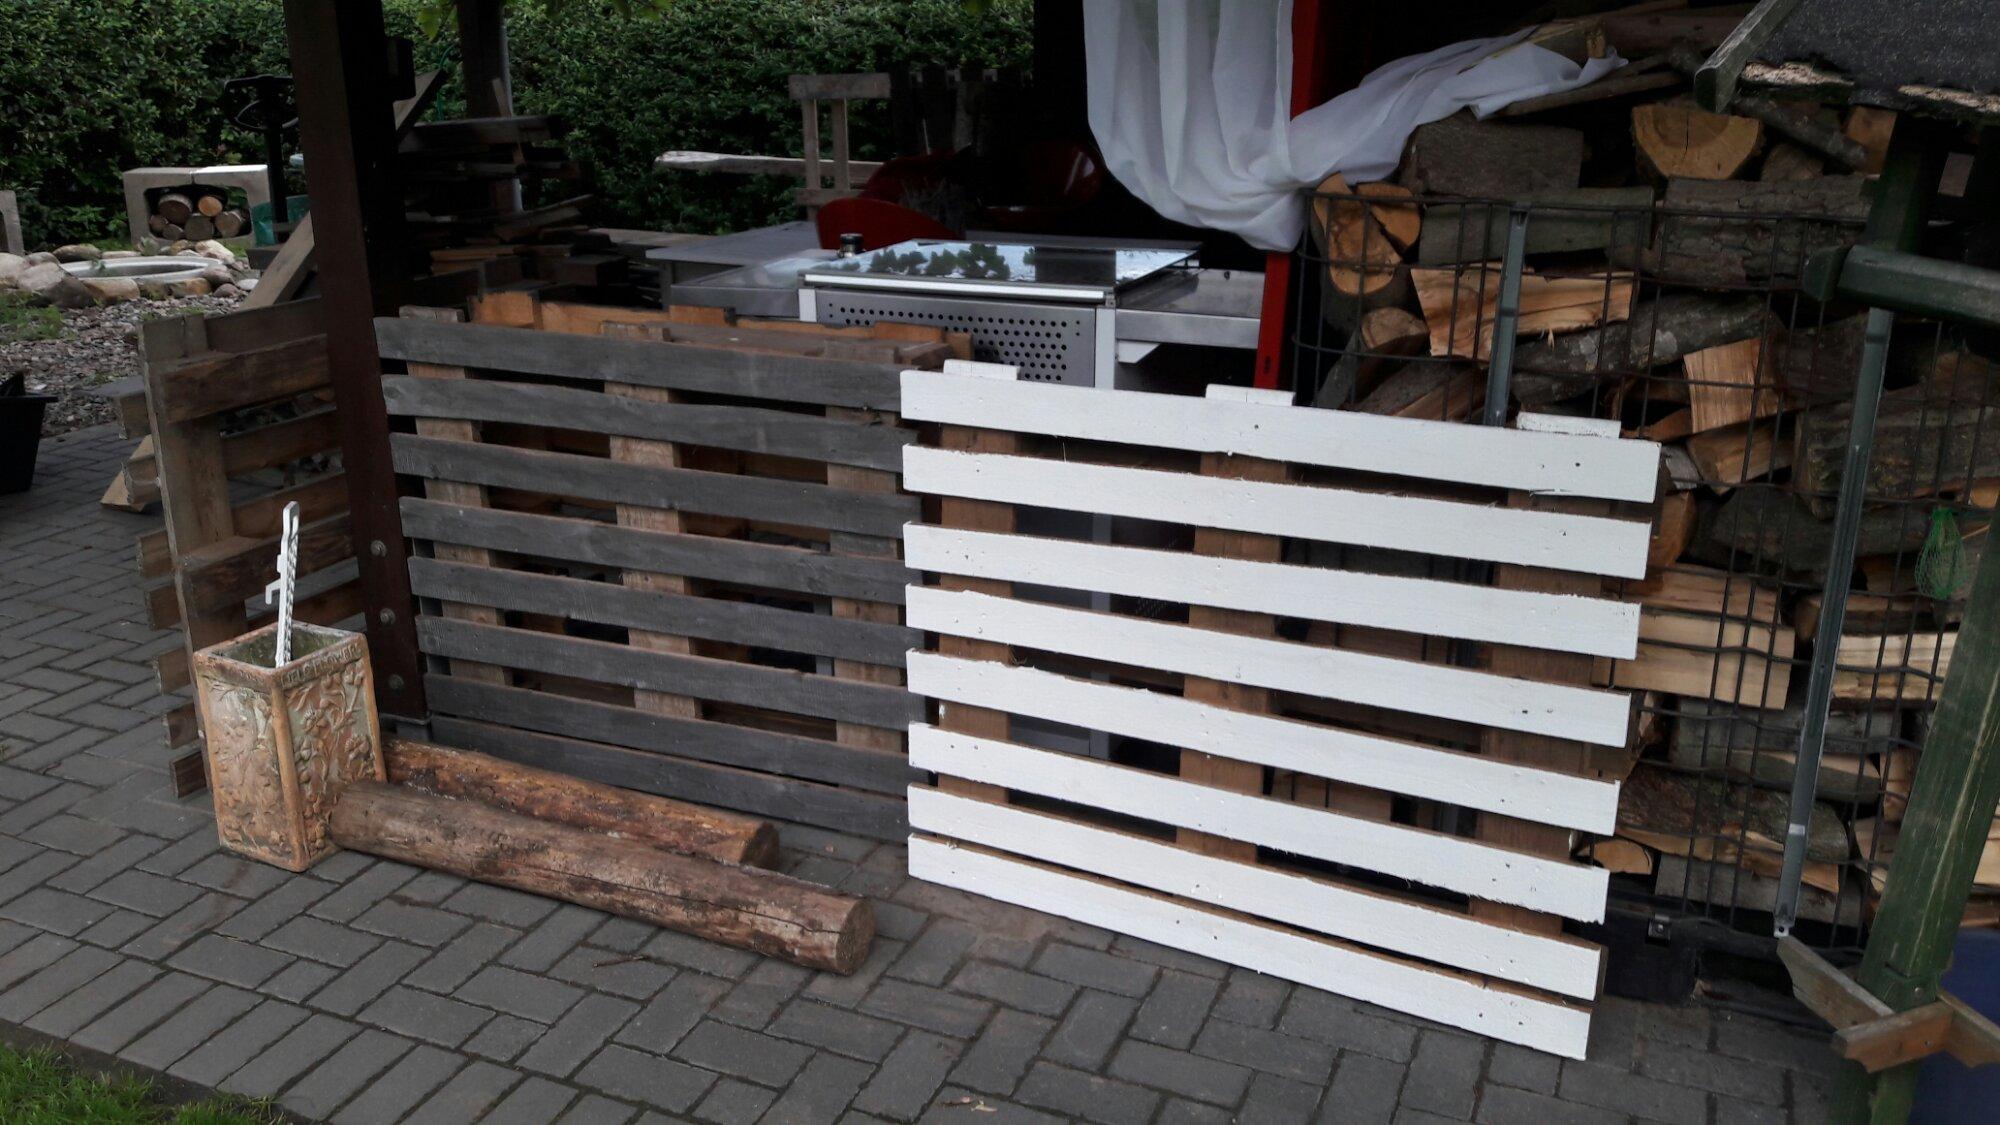 Outdoor Küche Europaletten : Paletten outdoor küche outdoor küche aus europaletten